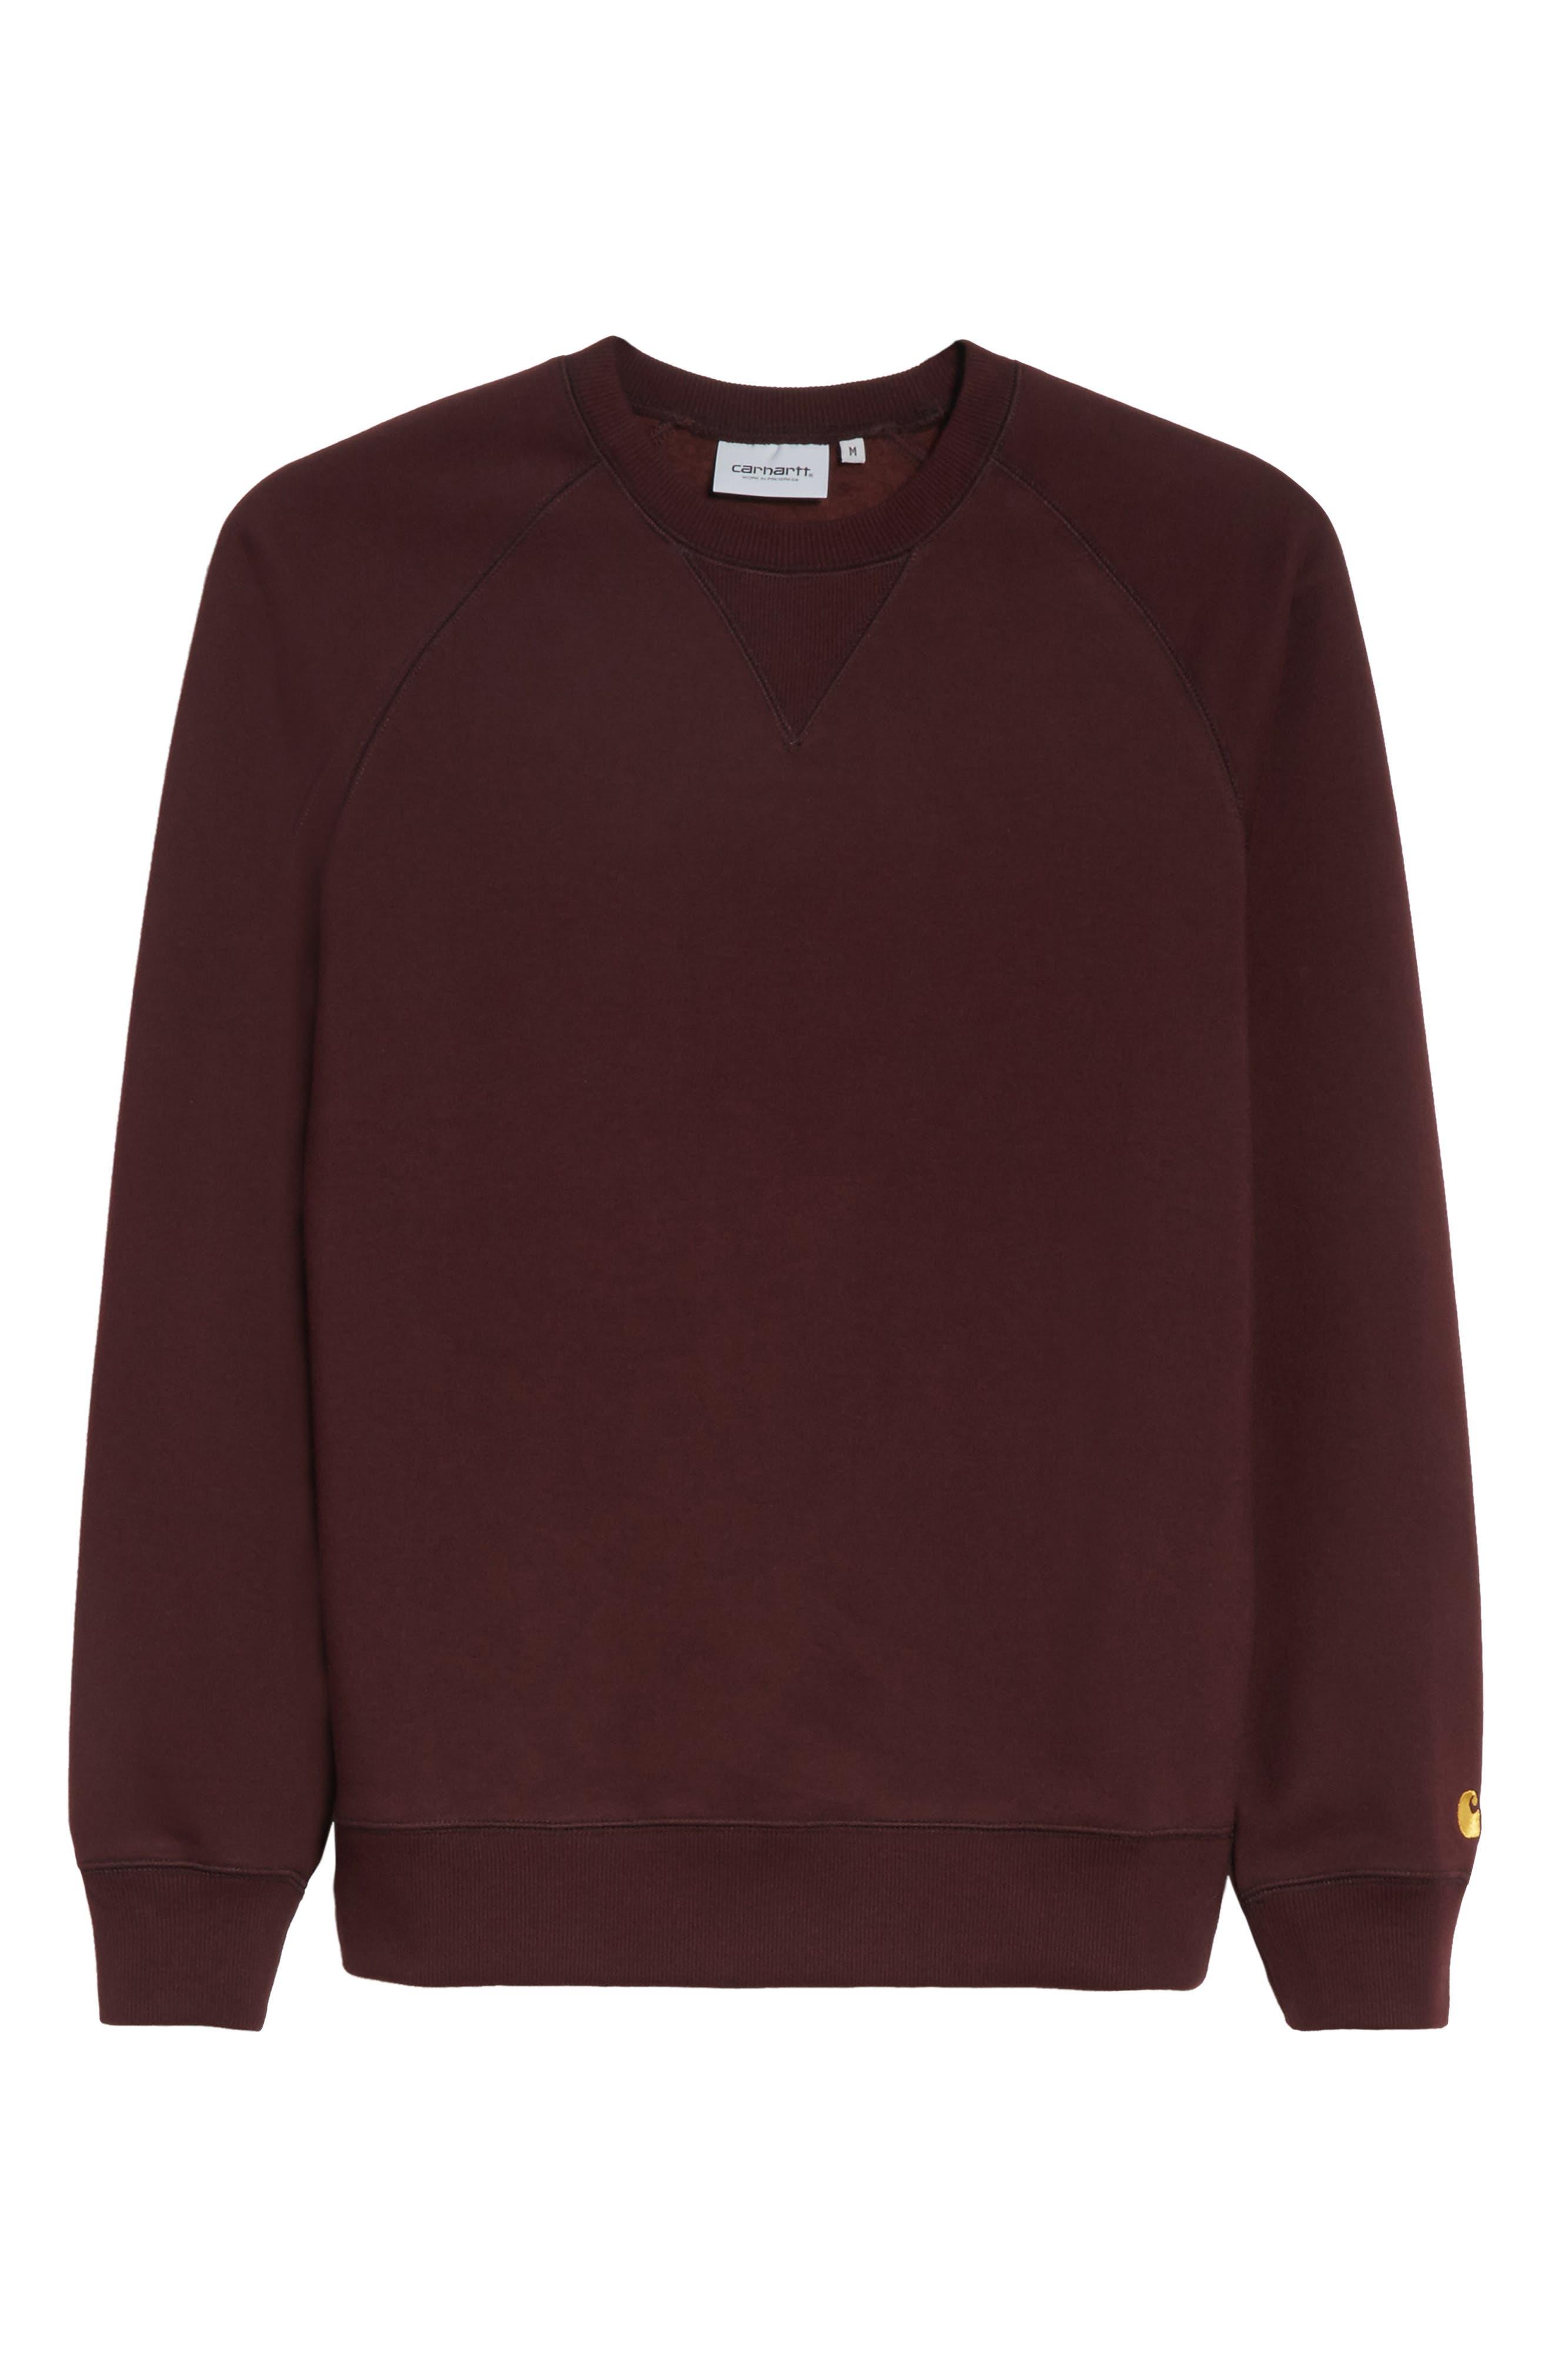 Crewneck Sweatshirt,                             Alternate thumbnail 6, color,                             Damson/ Gold